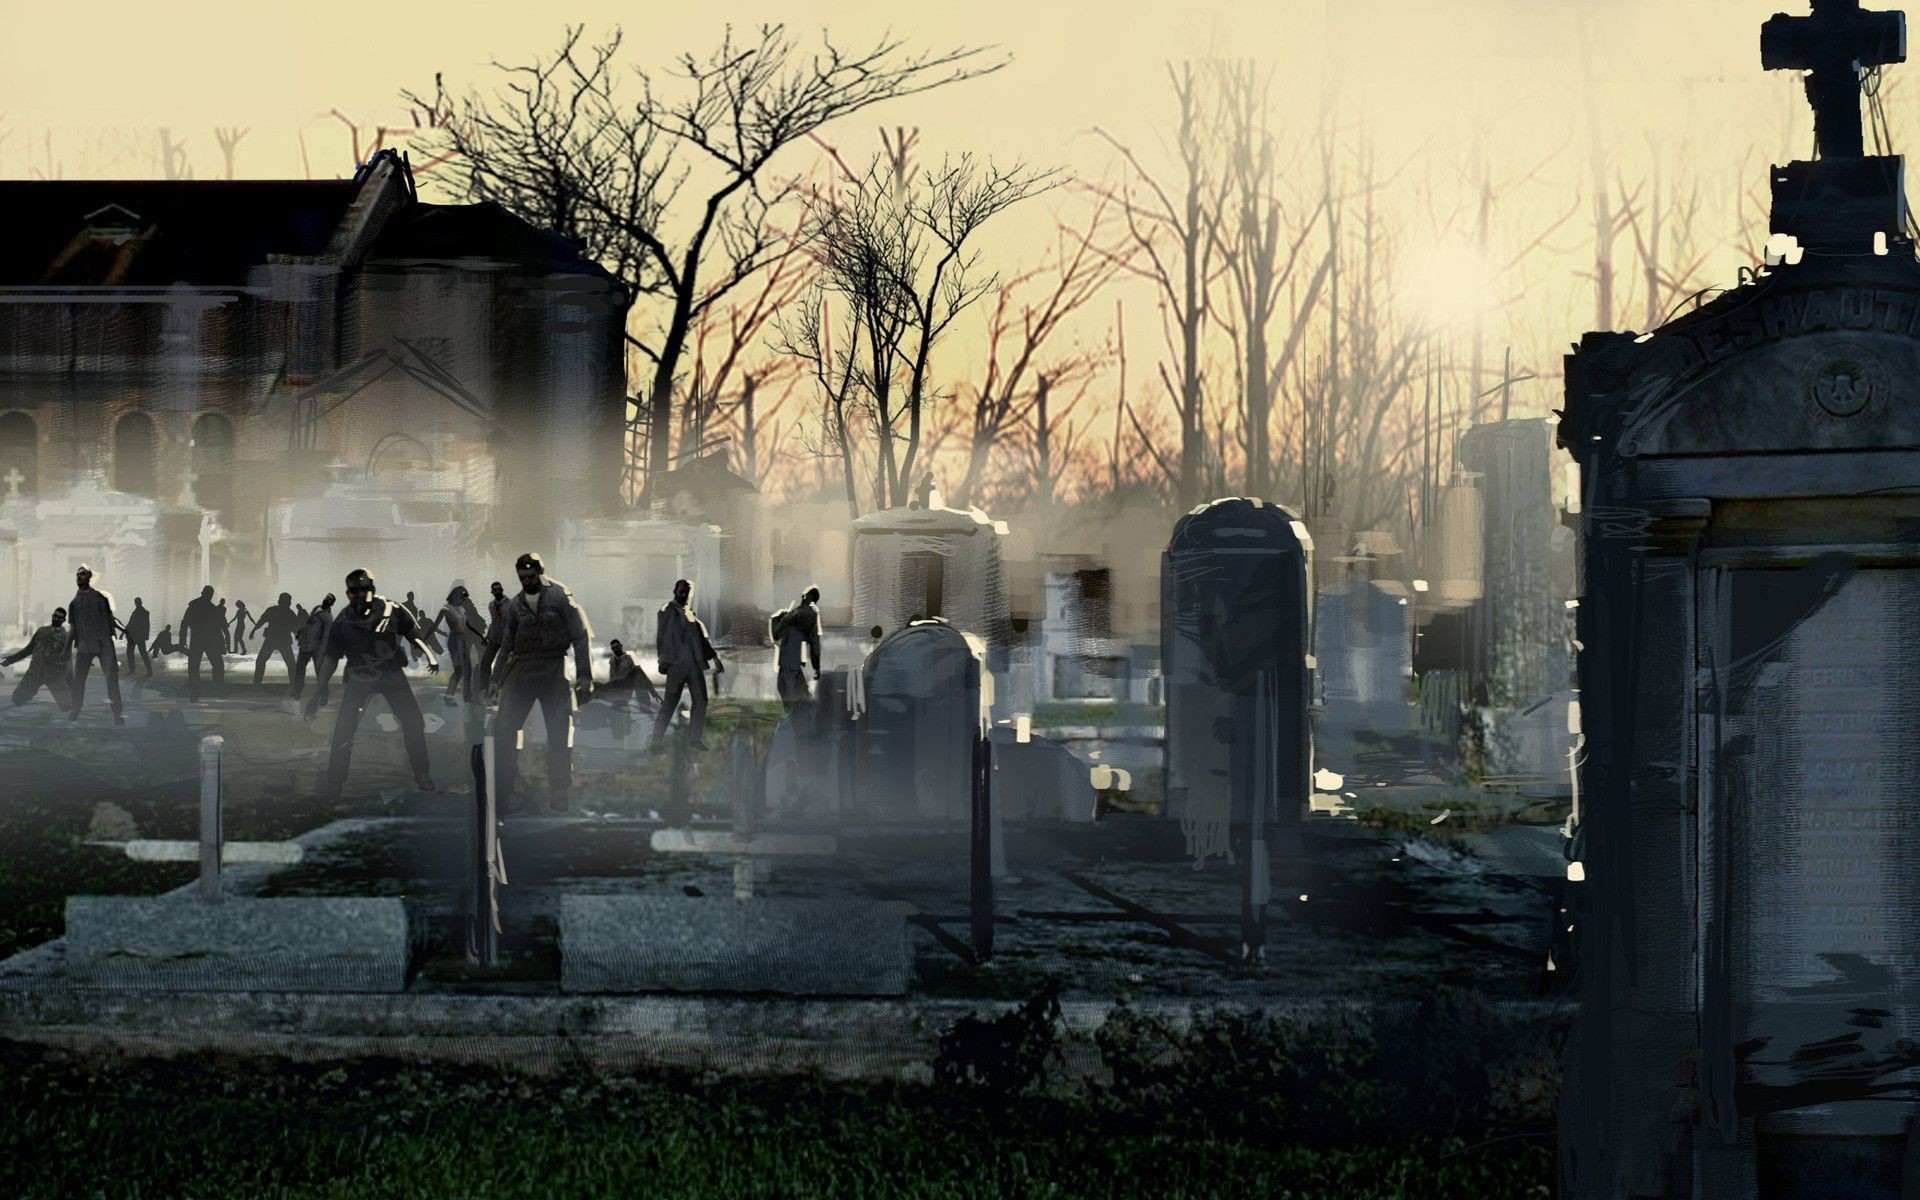 Zombie apocalypse 1600×1000 wallpaper art hd wallpaper download – Free  Download Zombies Wallpapers Czm946